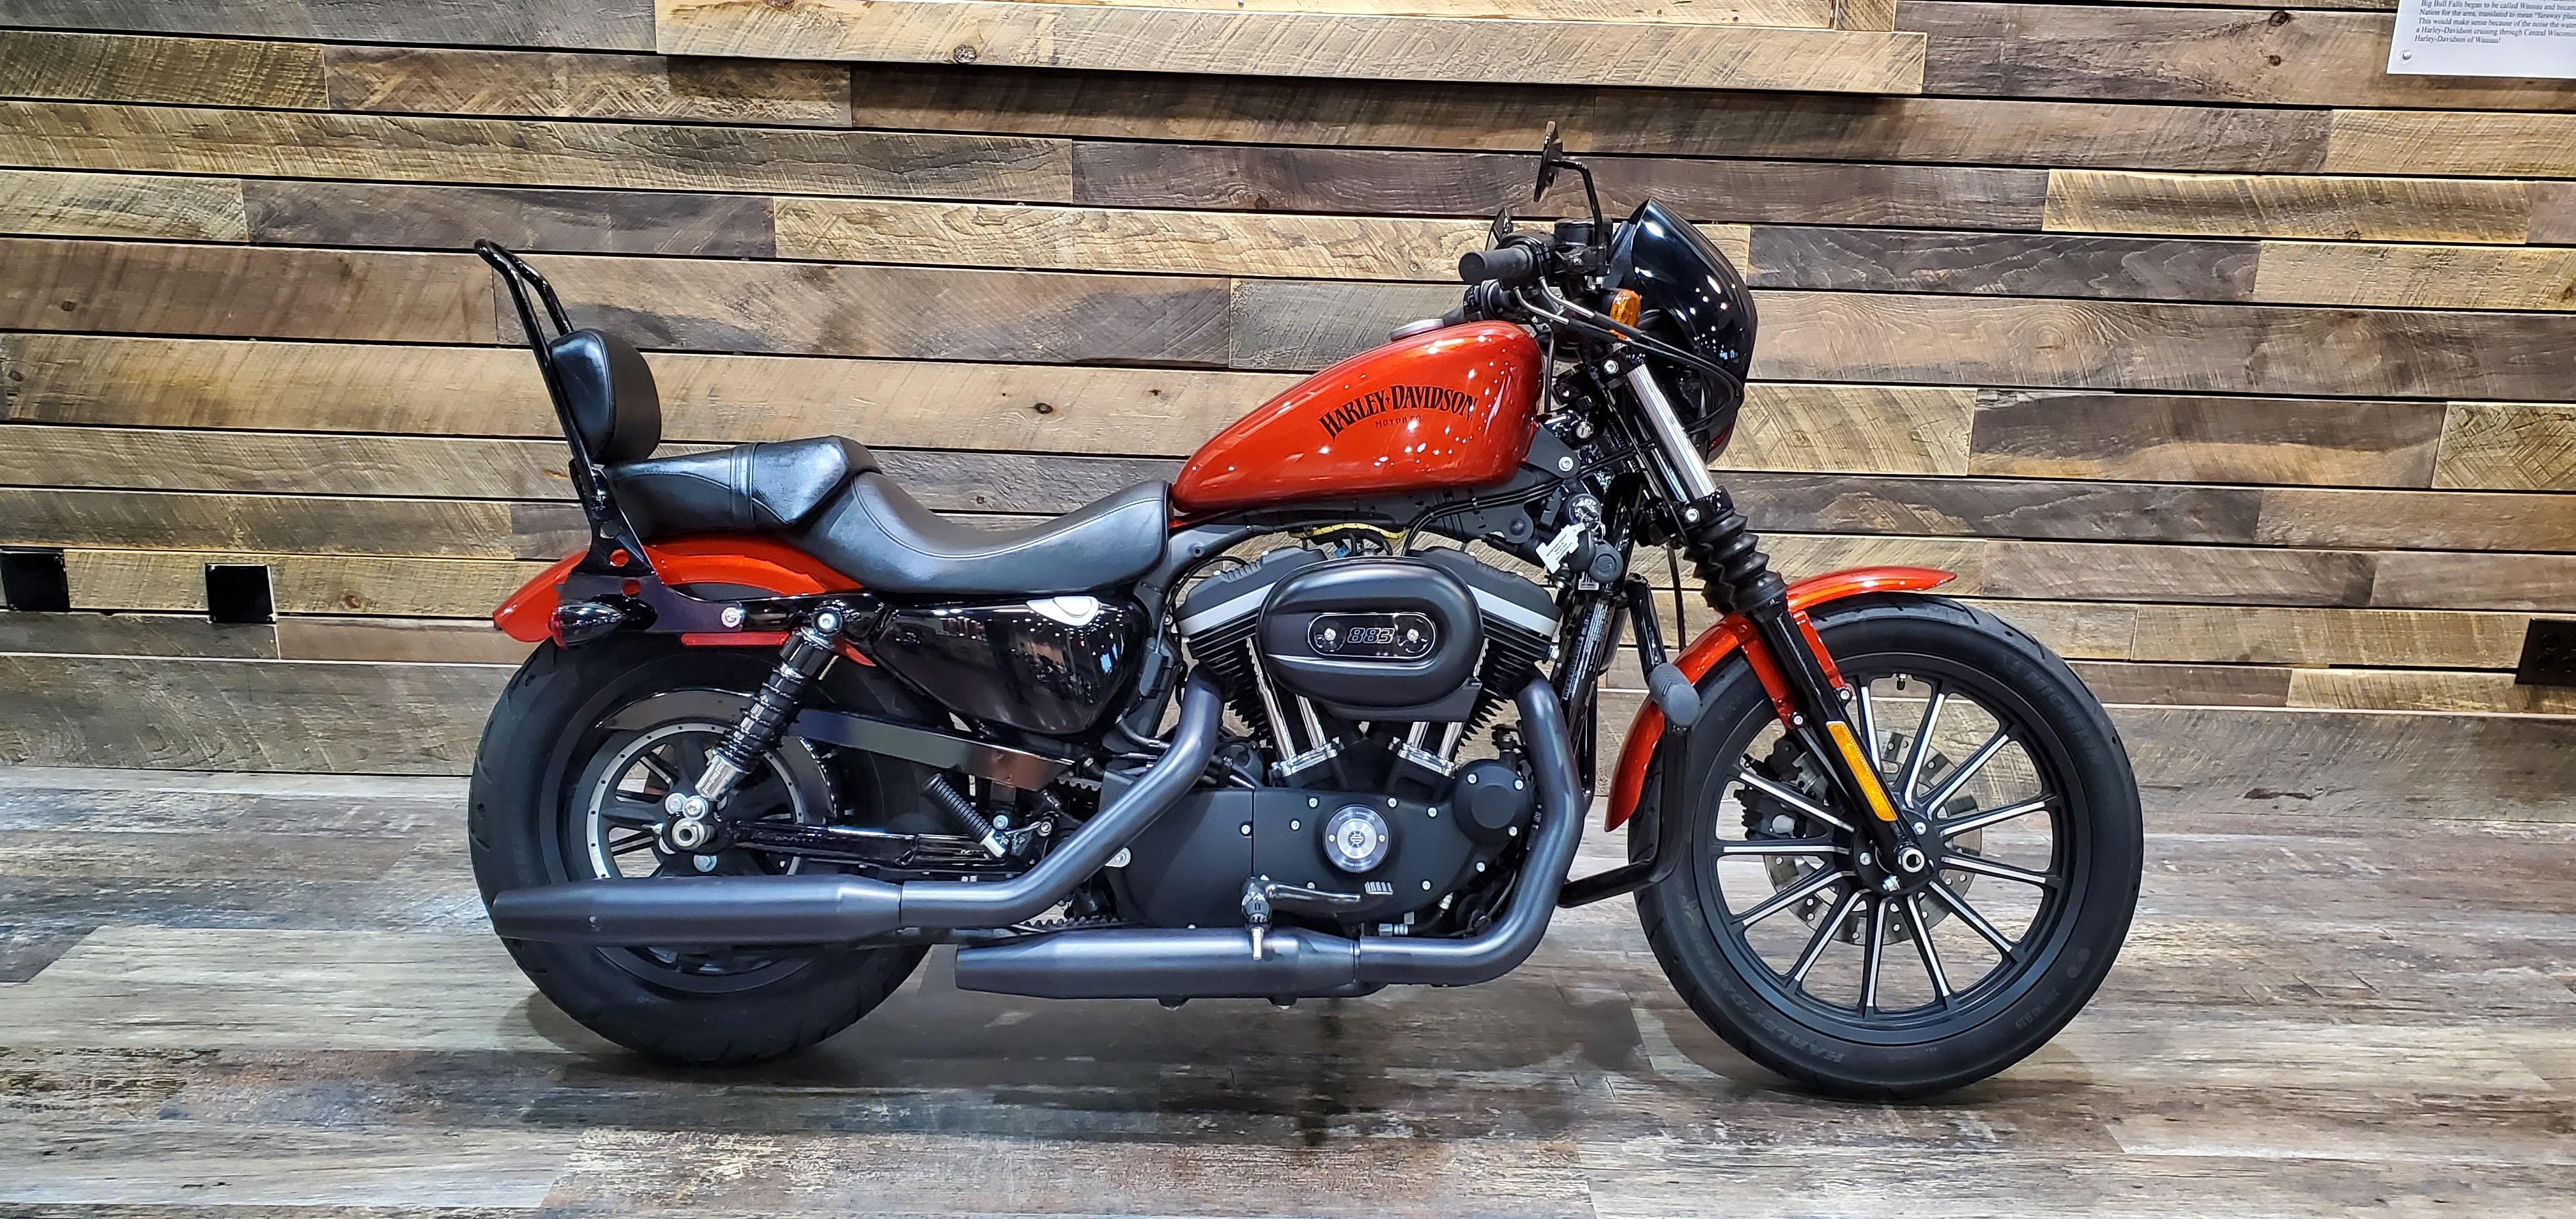 2013 Harley-Davidson Sportster 883 at Bull Falls Harley-Davidson